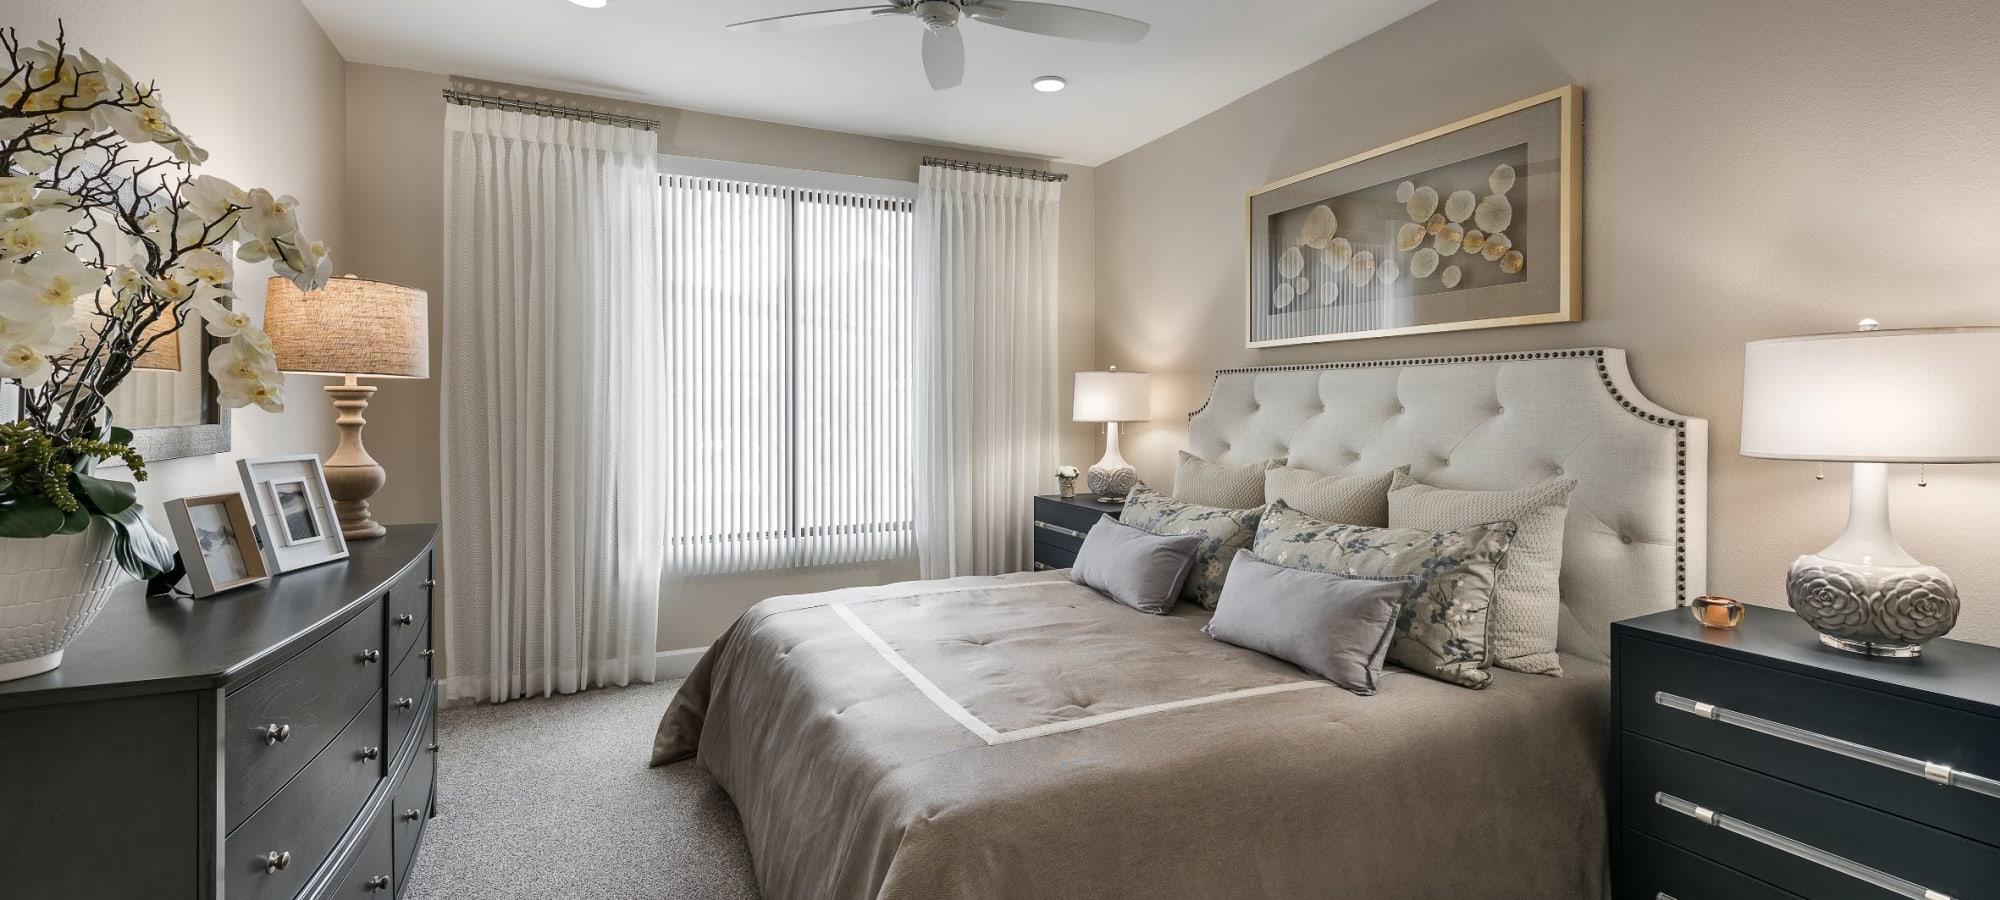 Spacious bedroom at San Artes in Scottsdale, Arizona